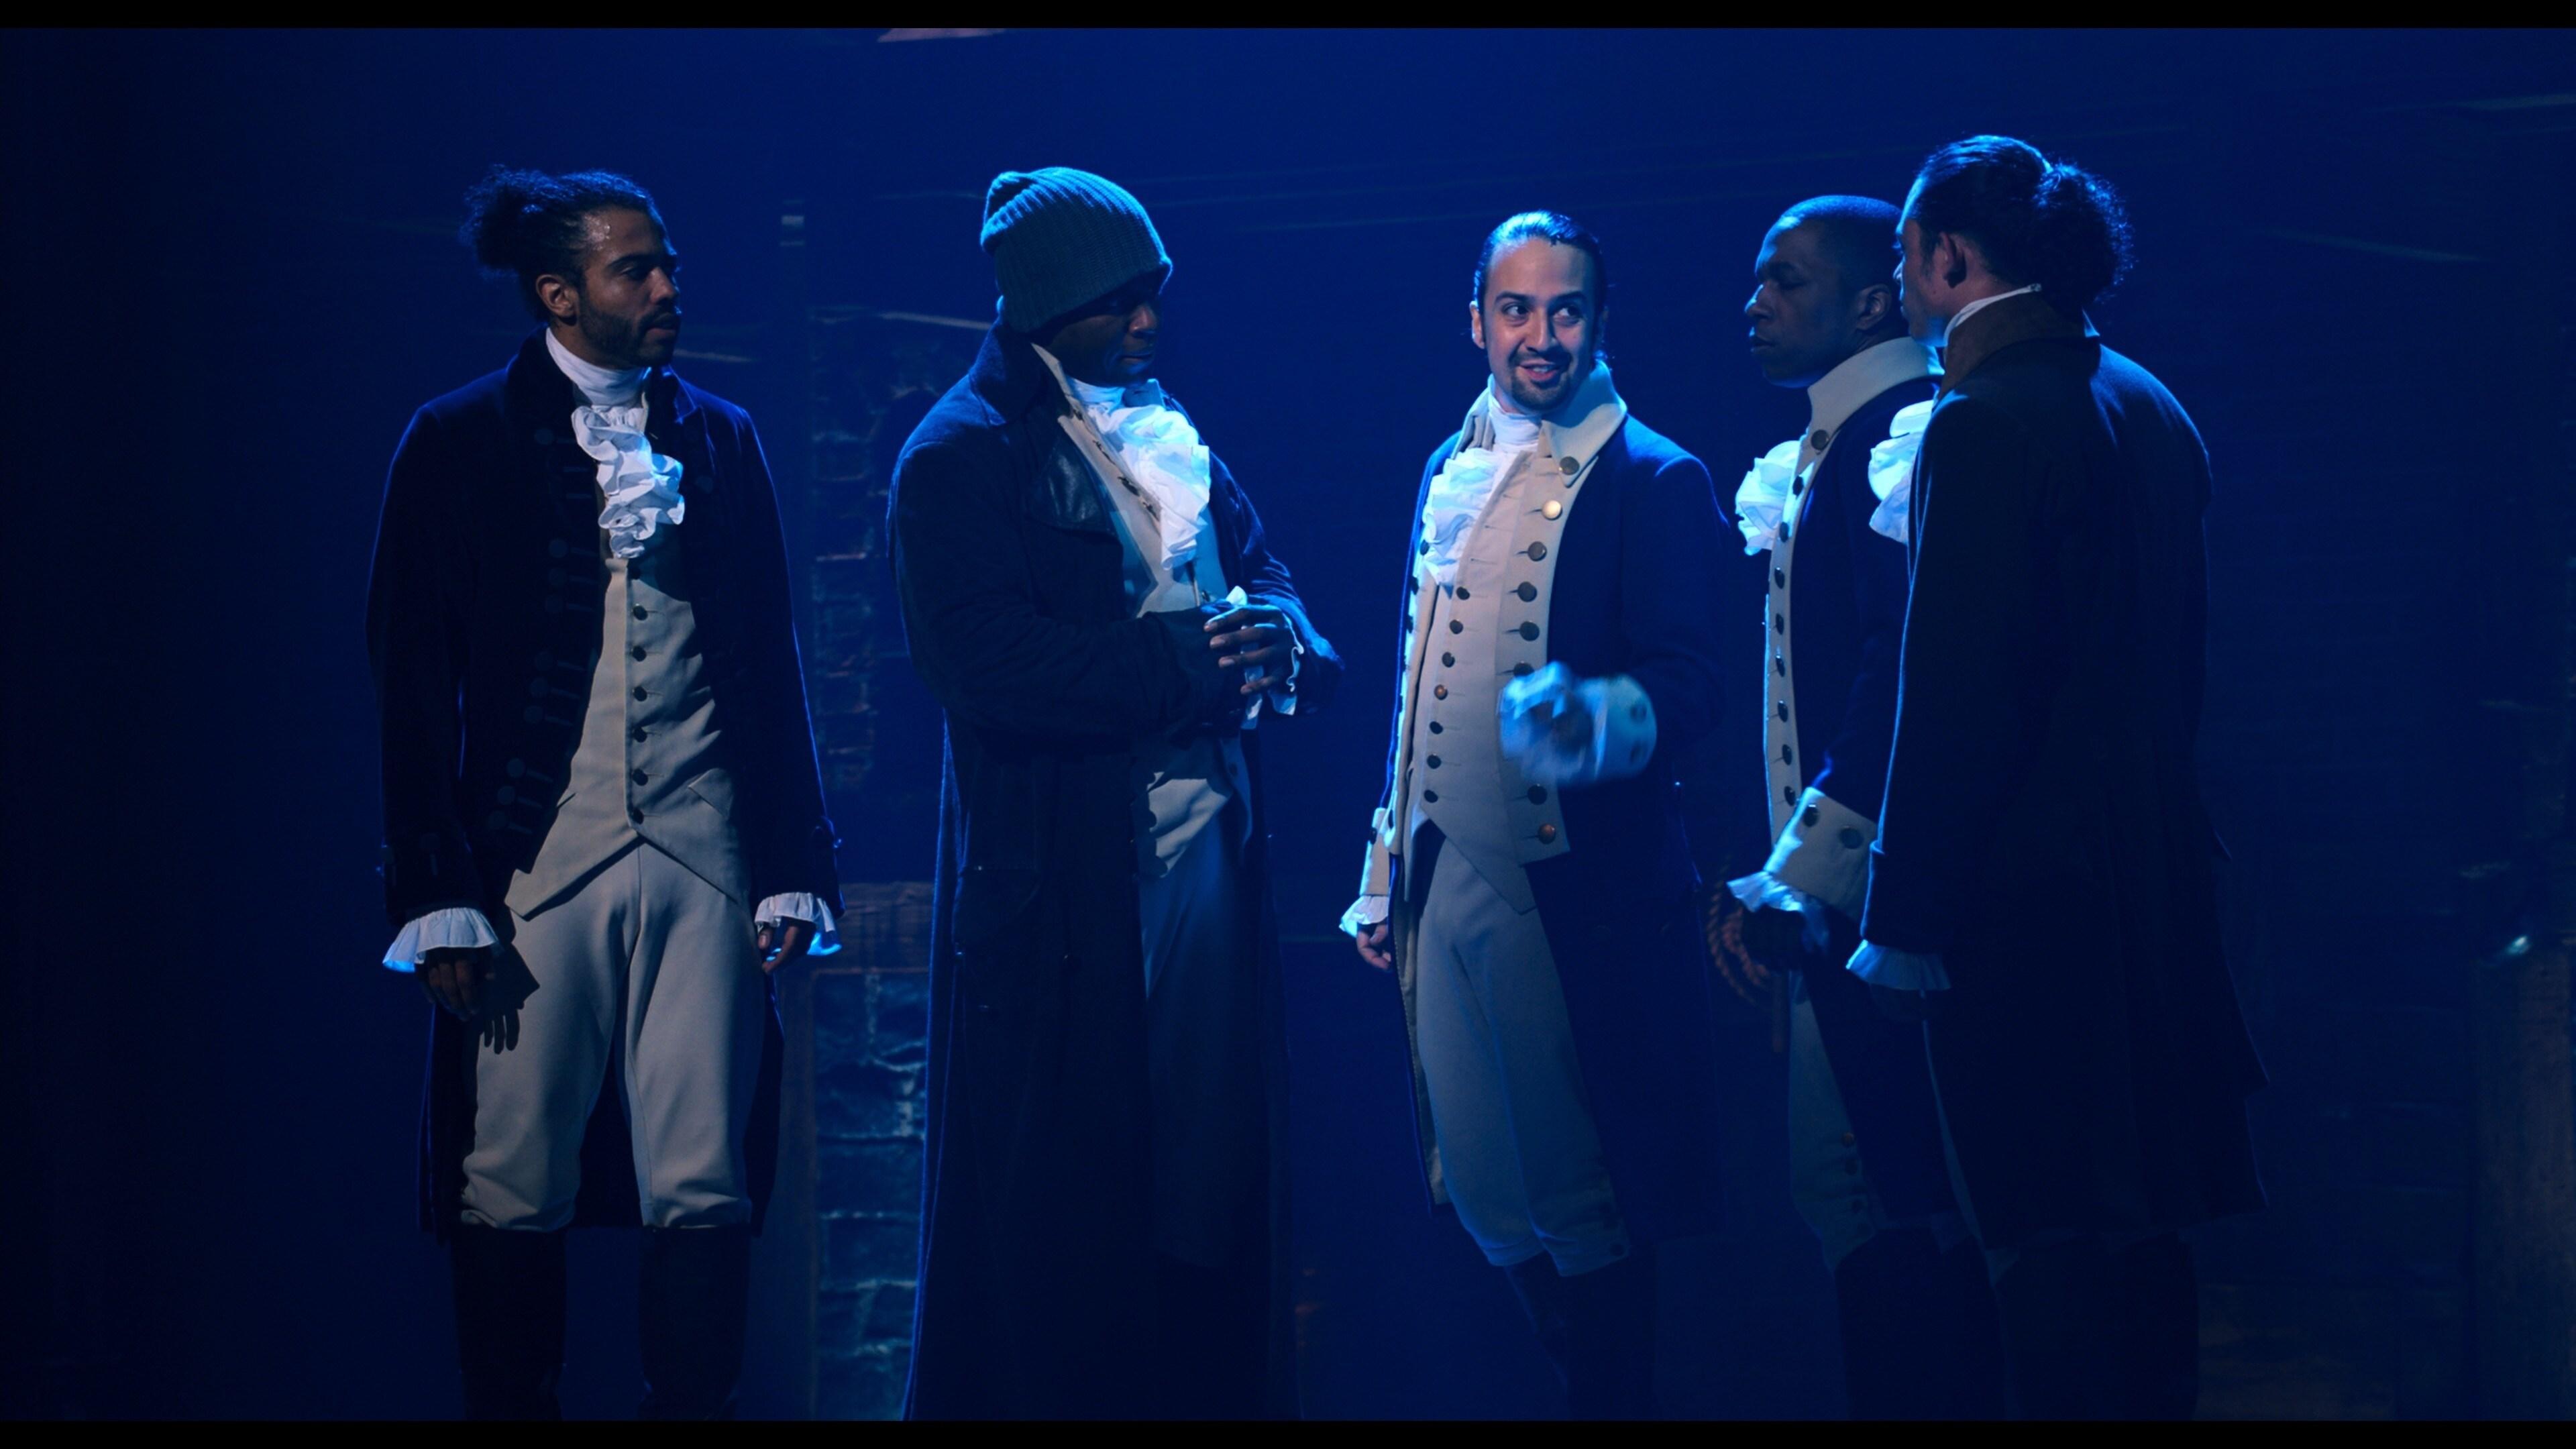 Daveed Diggs is the Marquis de Lafayette, Okieriete Onaodowan is Hercules Mulligan, Lin-Manuel Miranda is Alexander Hamilton, Leslie Odom, Jr. is Aaron Burr and Anthony Ramos is John Laurens in HAMILTON, the filmed version of the original Broadway production.